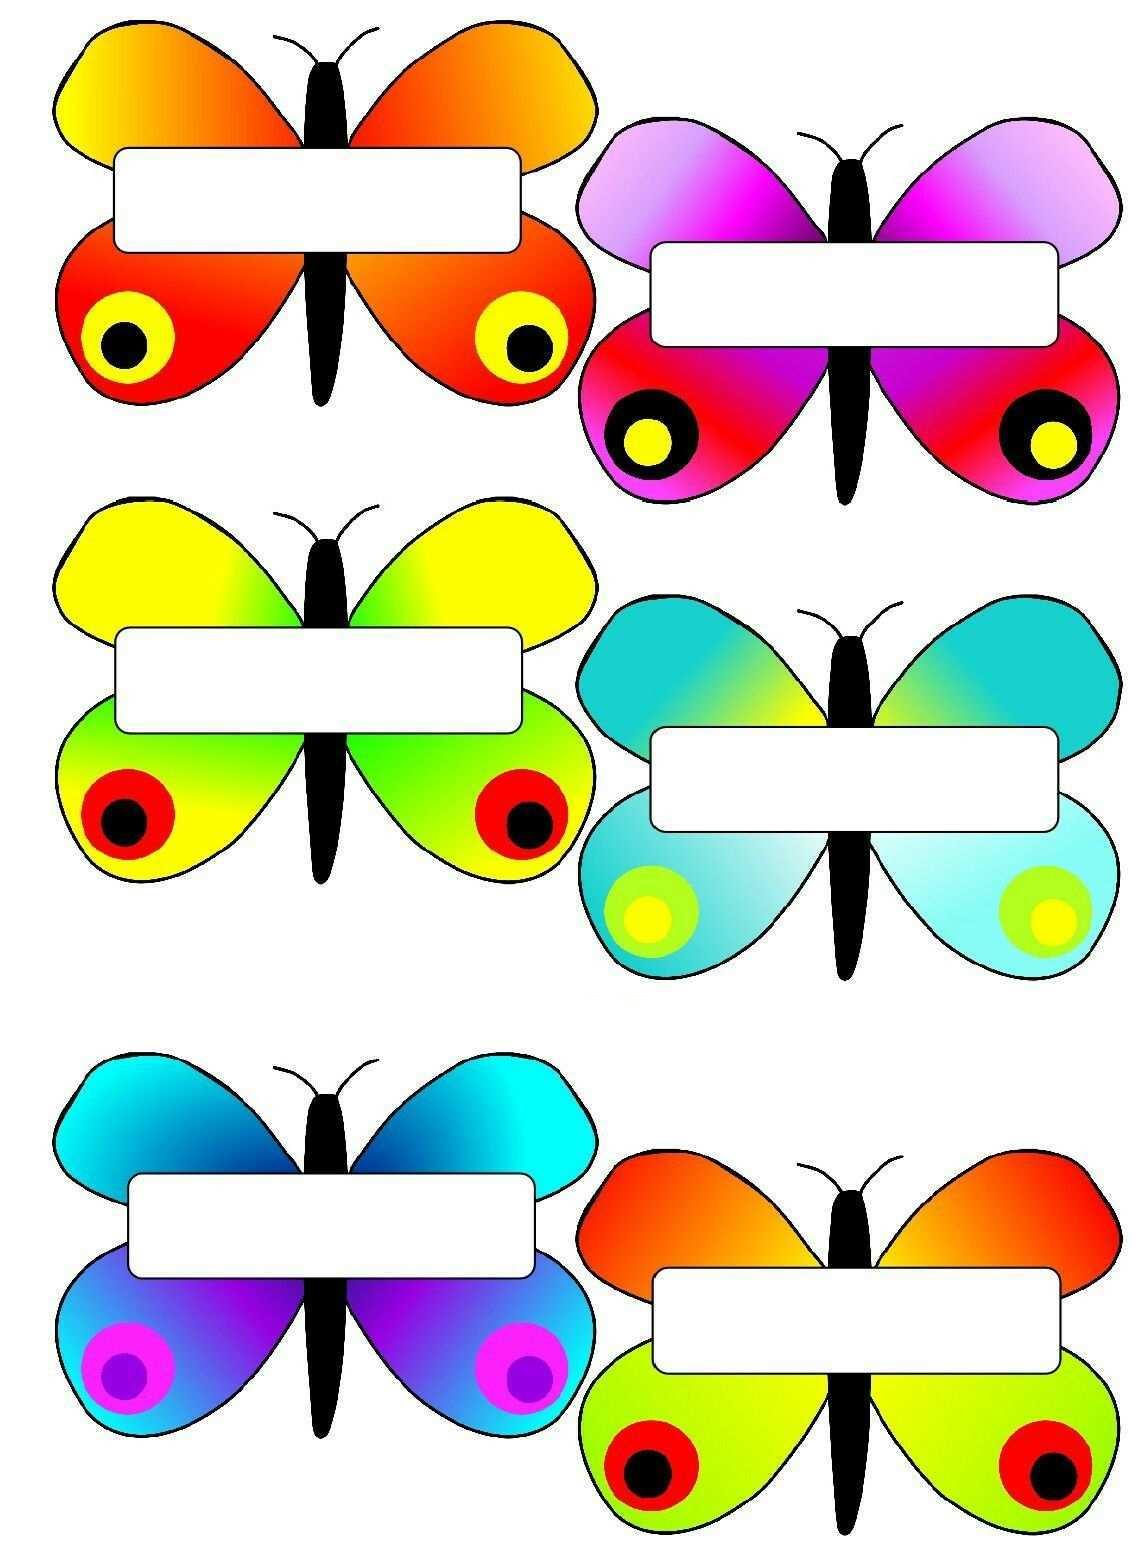 Etiquetas Mariposas Etiquetas Escolares Para Imprimir Calendario Para Ninos Libros De Recuerdos